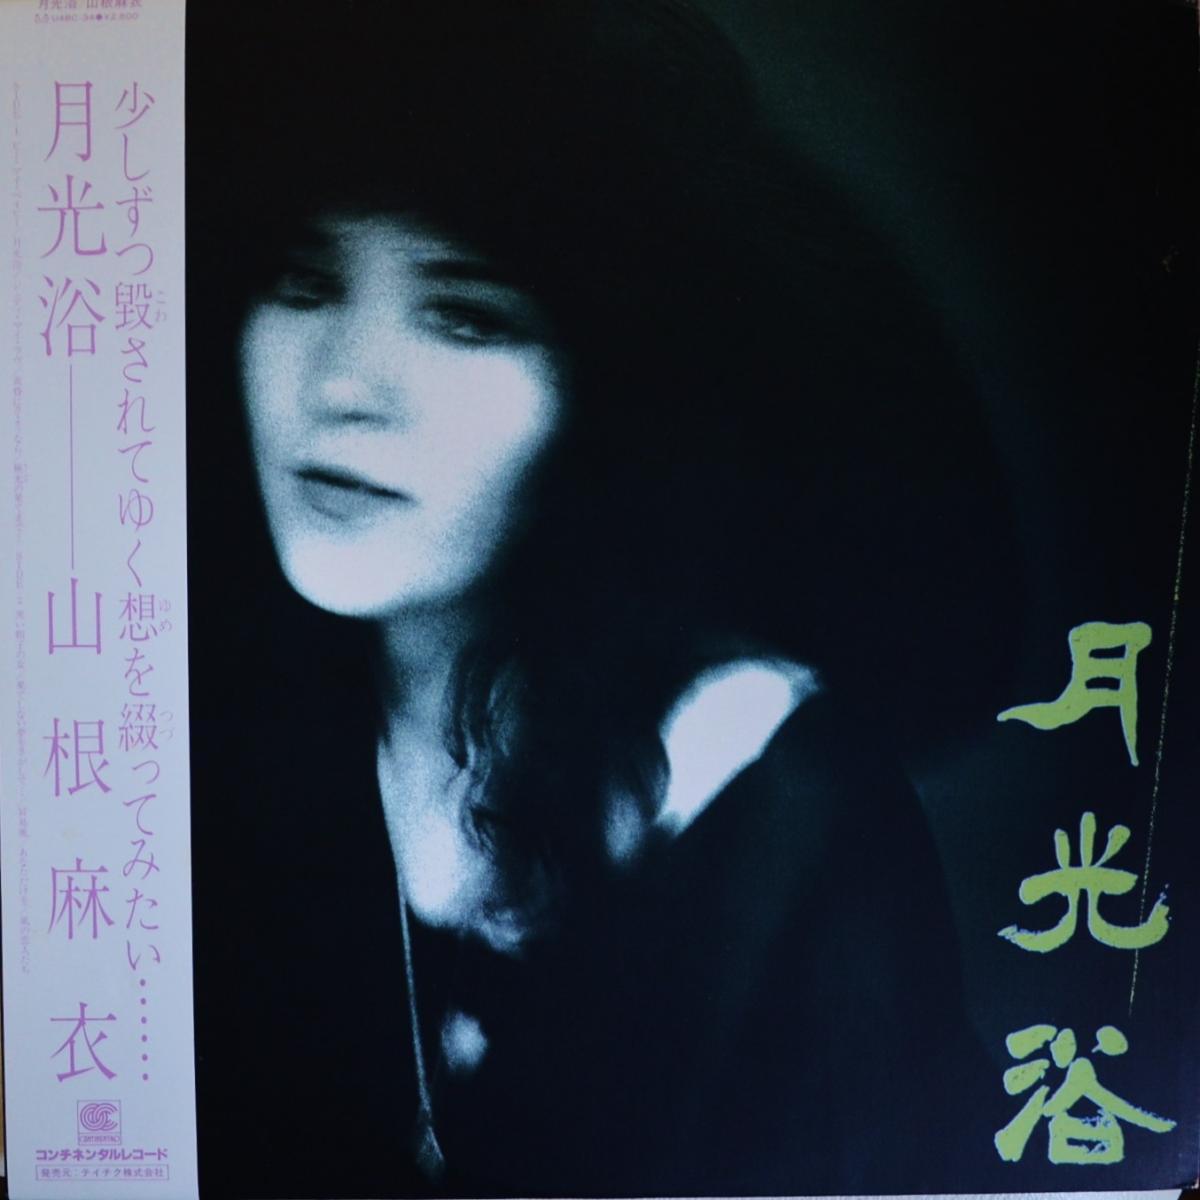 山根麻衣 MAI YAMANE / 月光浴 (LP)